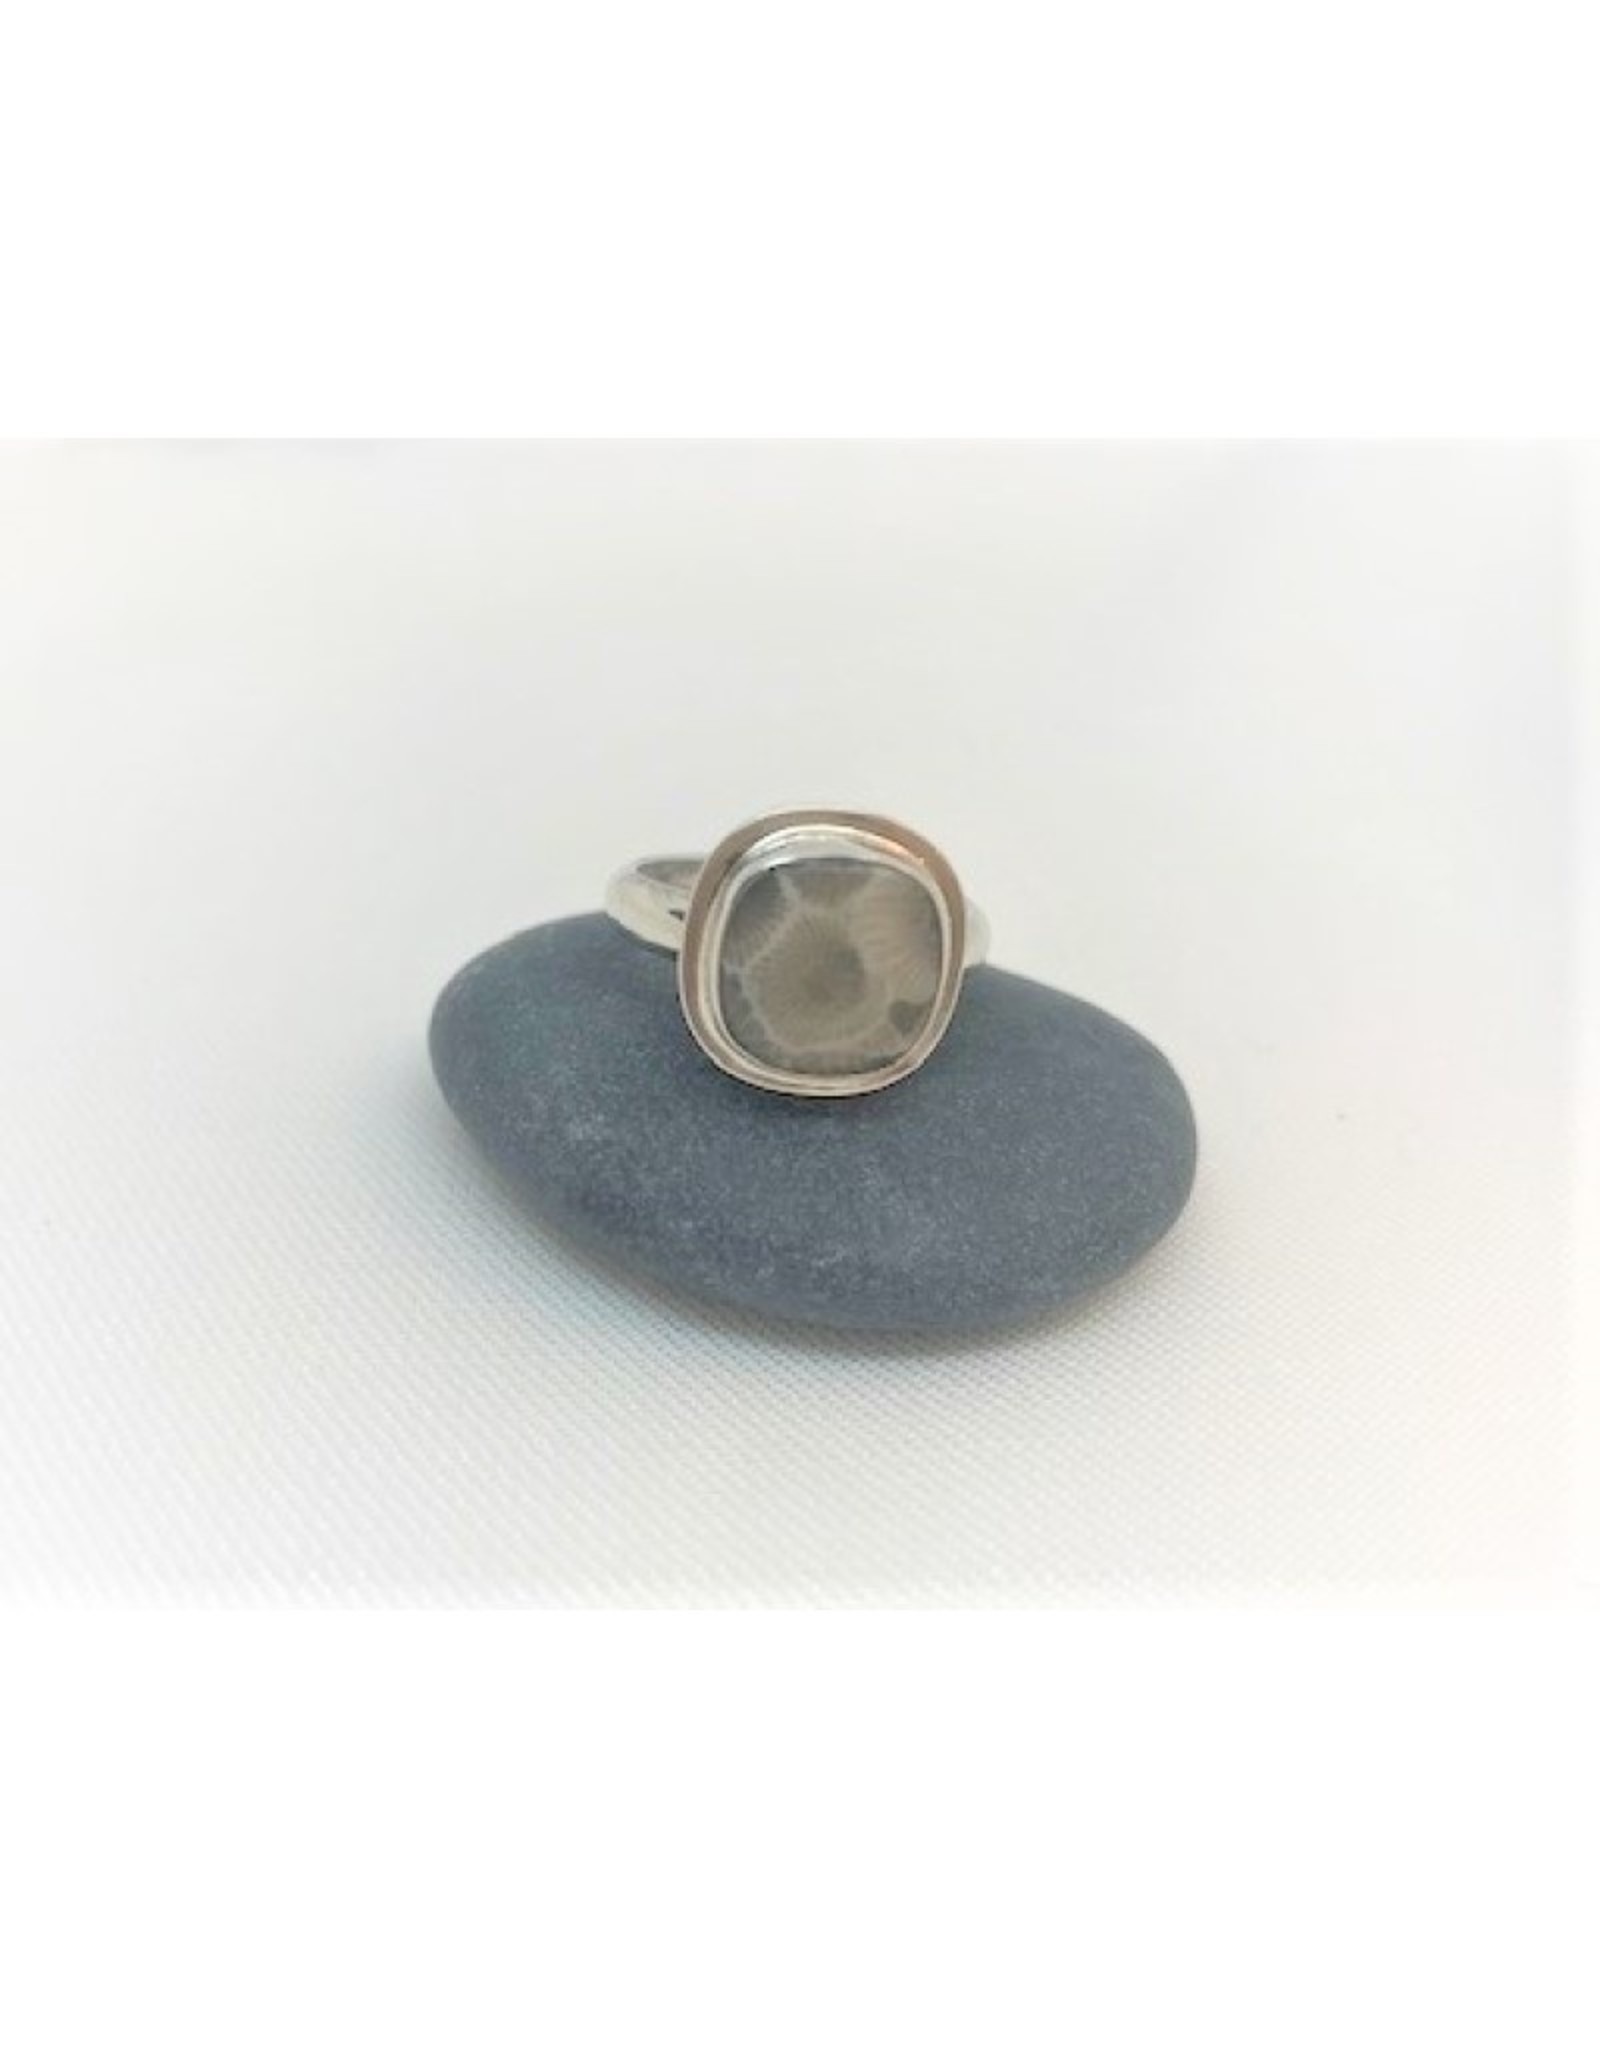 Bezel Set Ring - Petoskey Stone Square